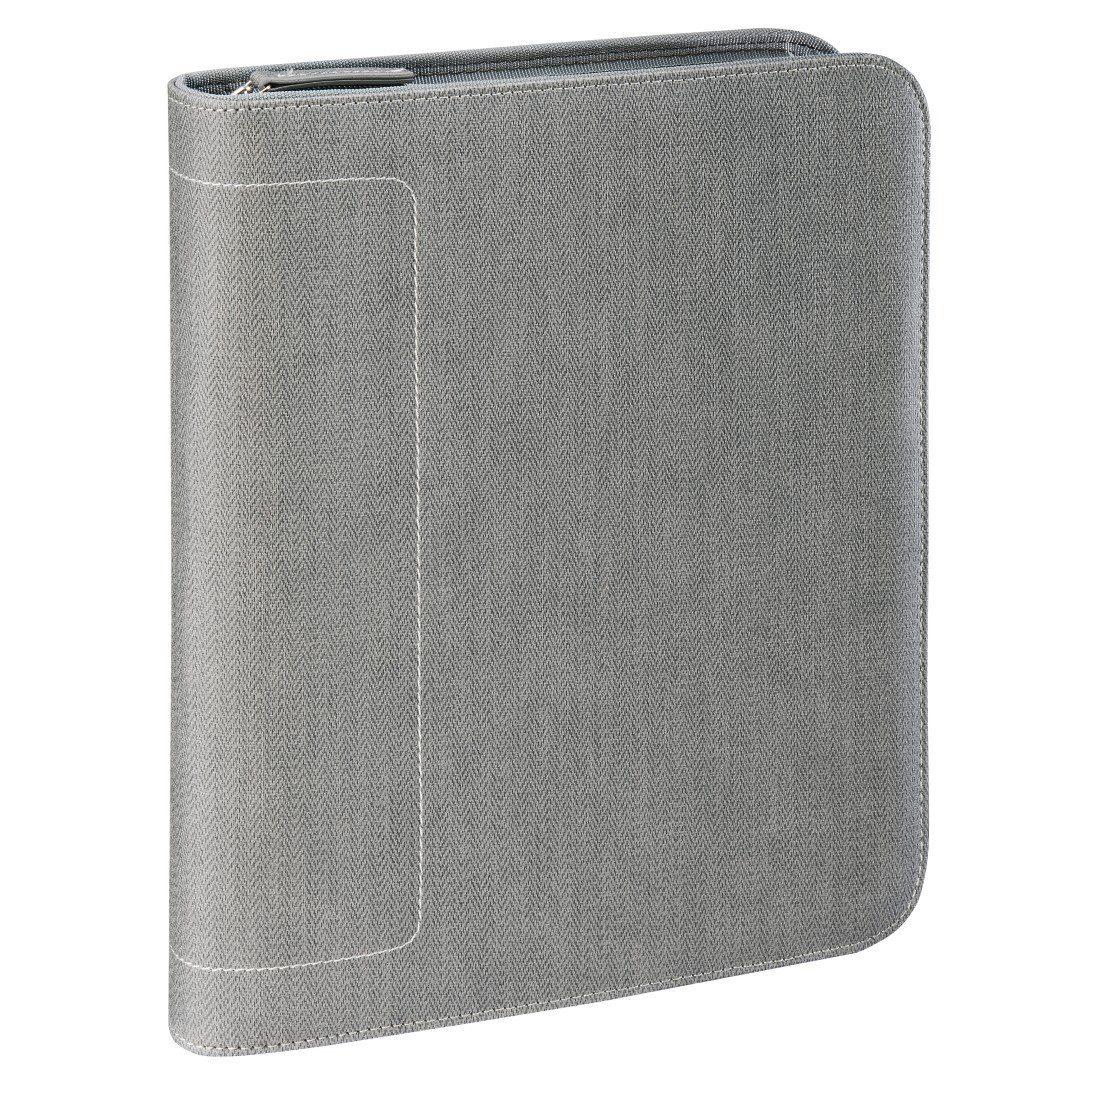 Hama est. 1923 Tablet-Organizer A5 Hannover, Light Grey